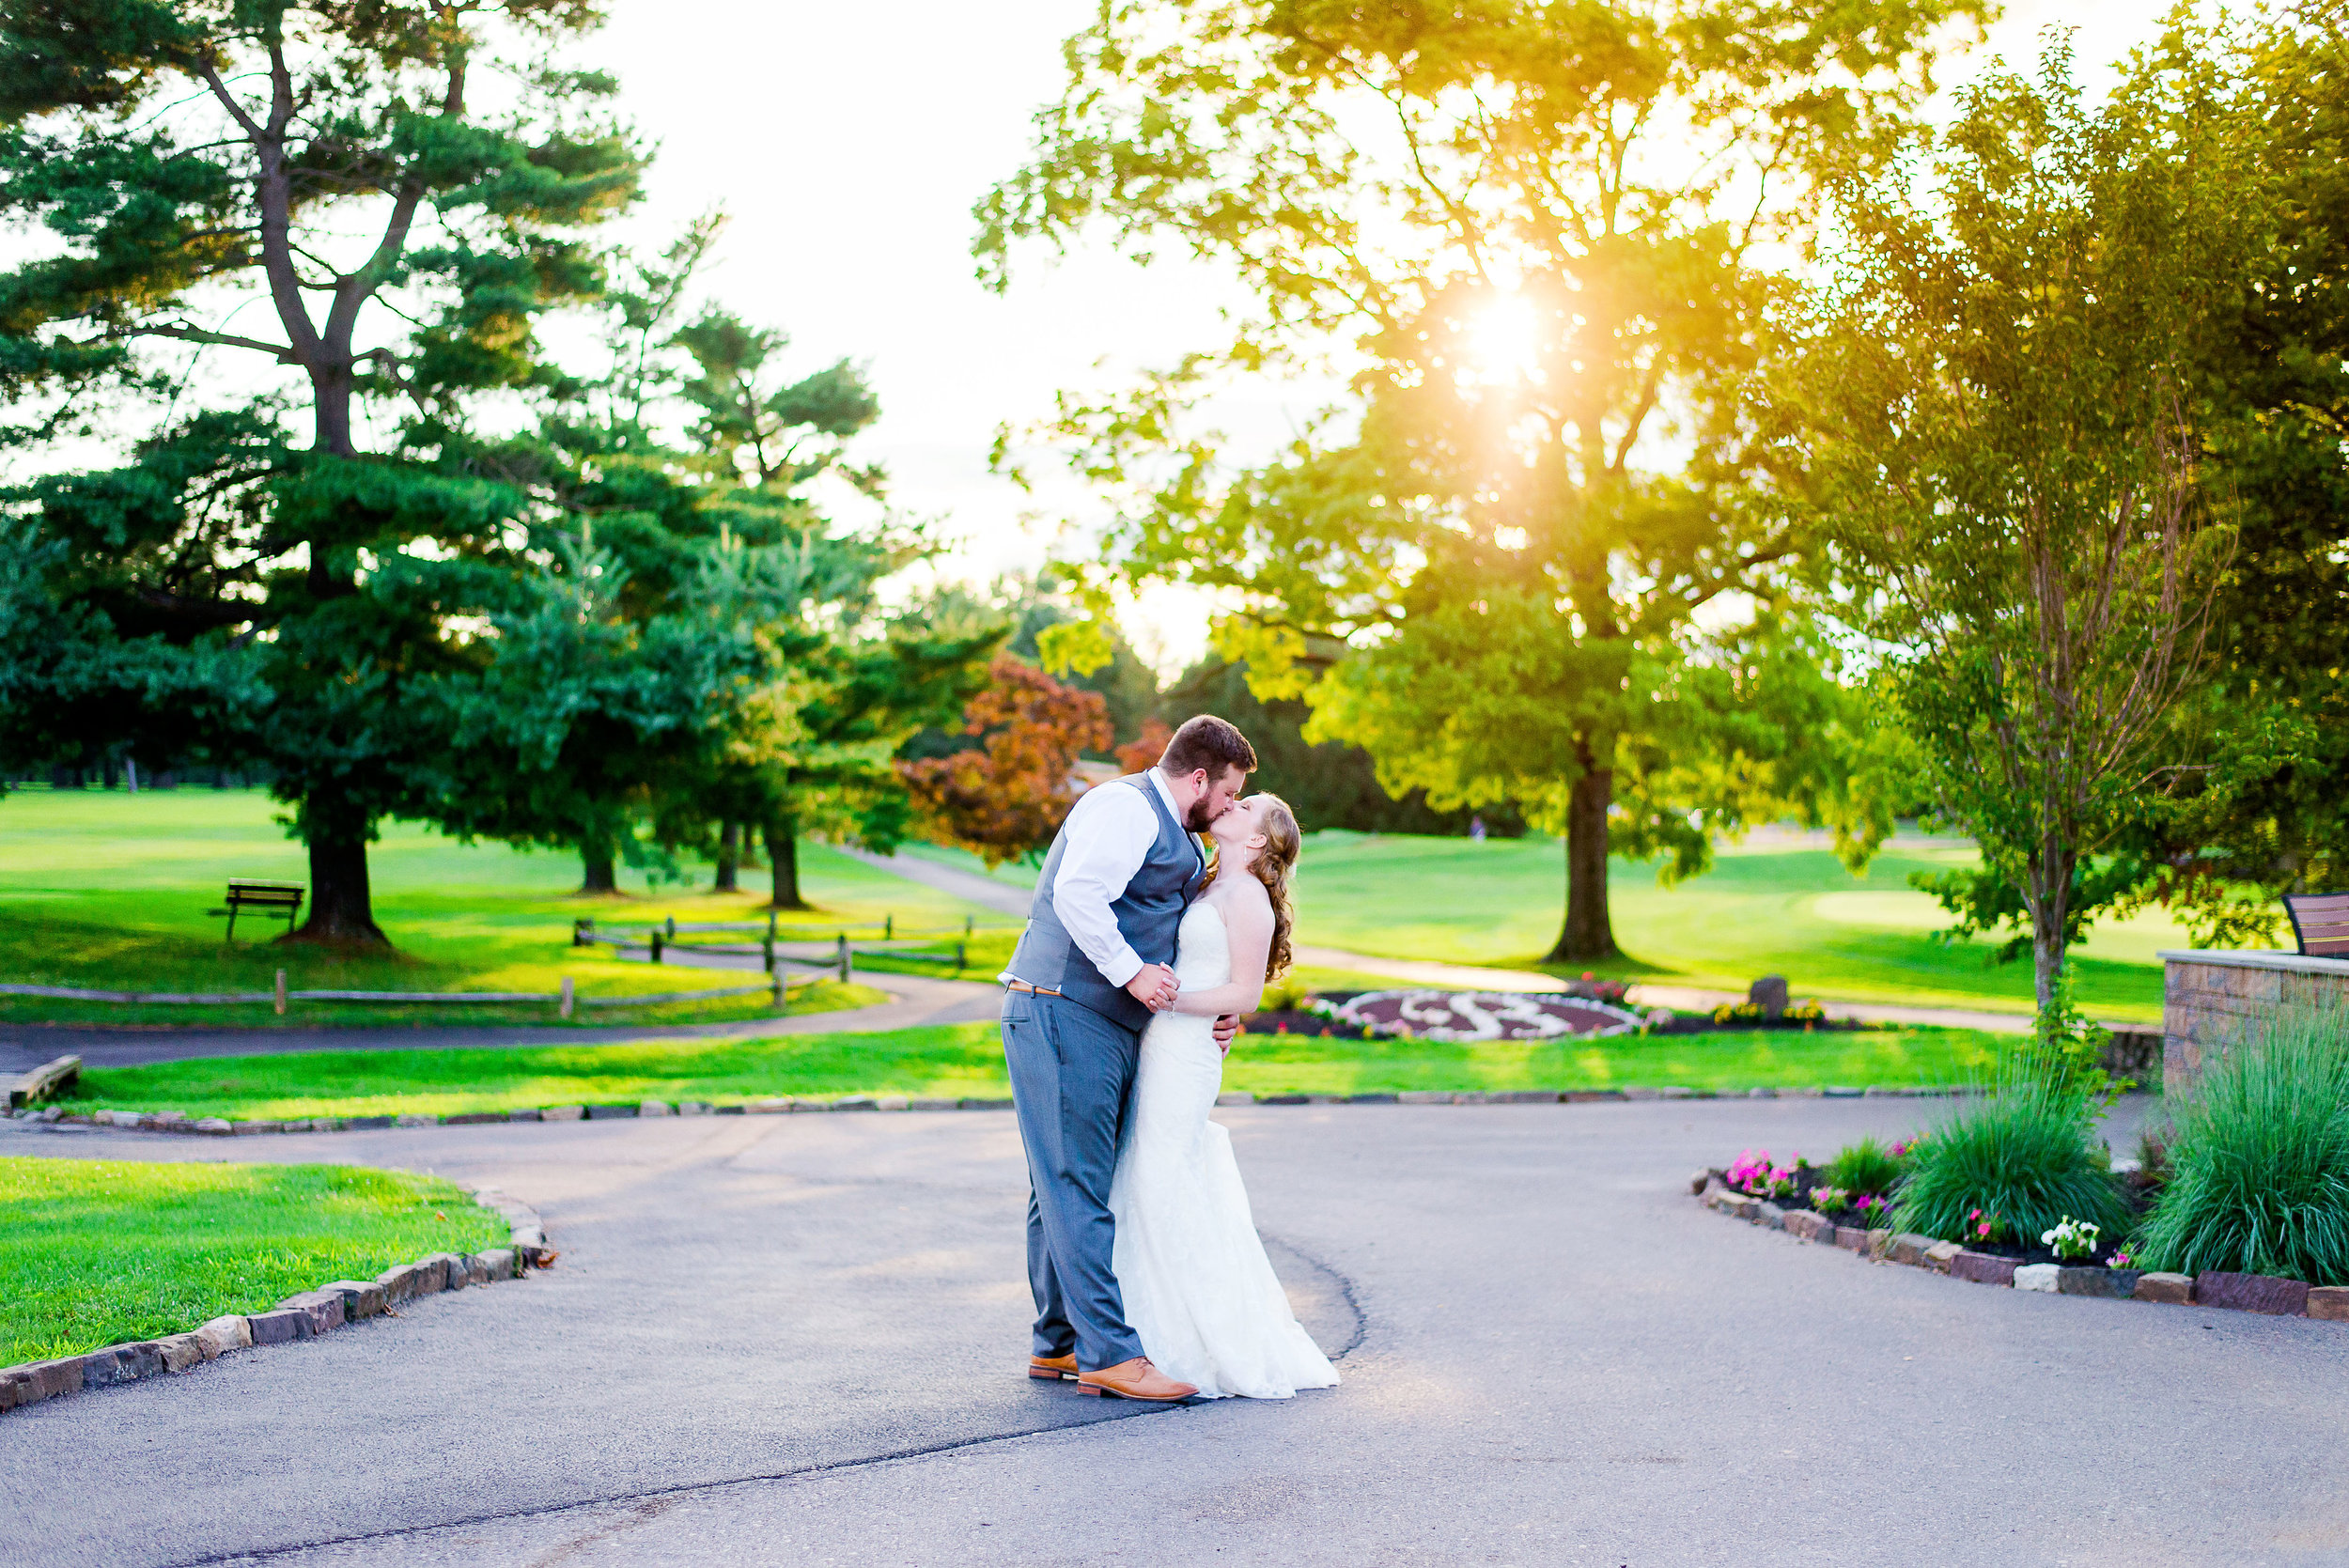 Bucks_County_Pennsylvania_Wilson_Wedding_Reception_Photographer_Andrea_Krout_Photography-120.jpg